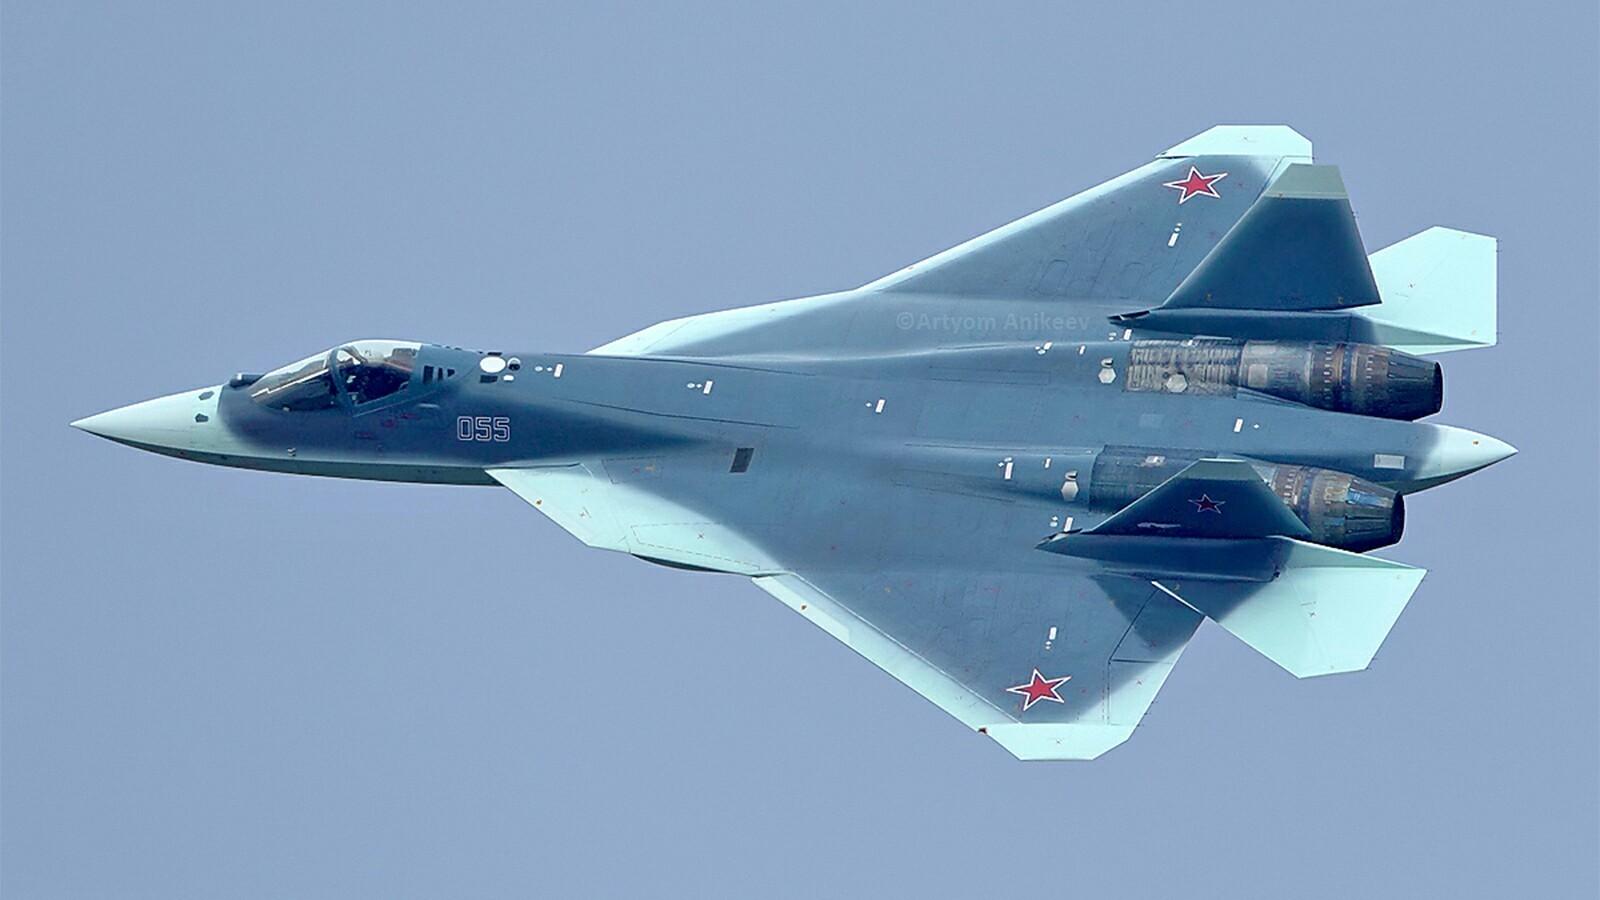 Sukhoi SU-57 Russian Super Stealth fighter jets Amazing maneuver